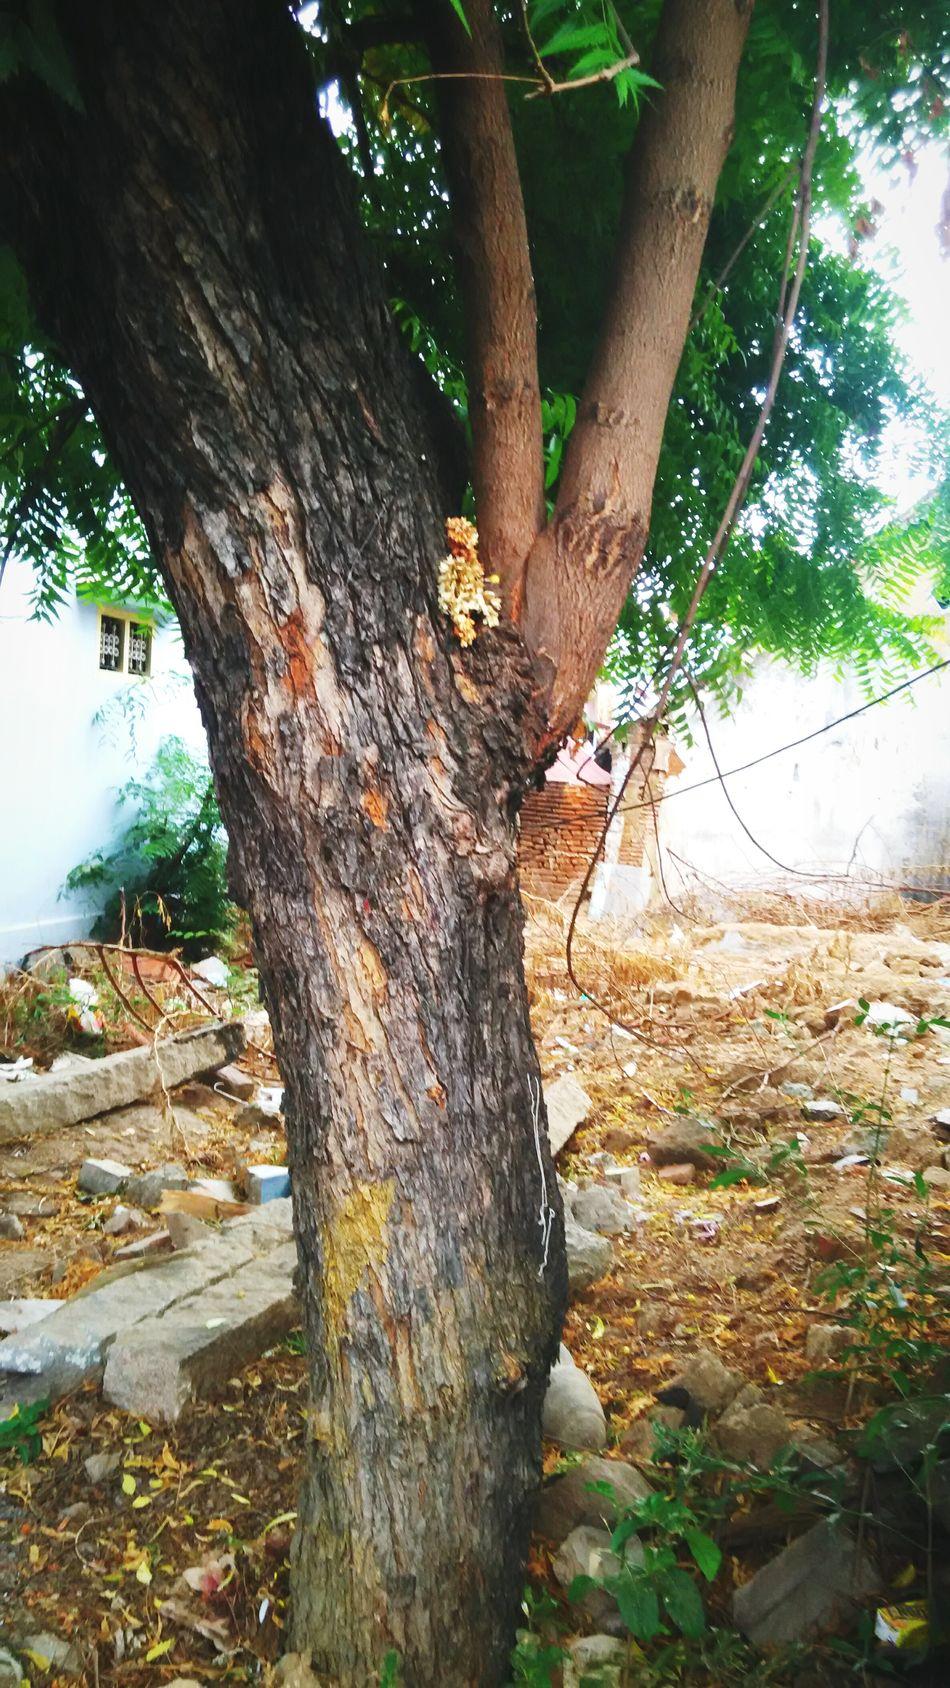 Tree, Nature, Morning, Green, God, Neem